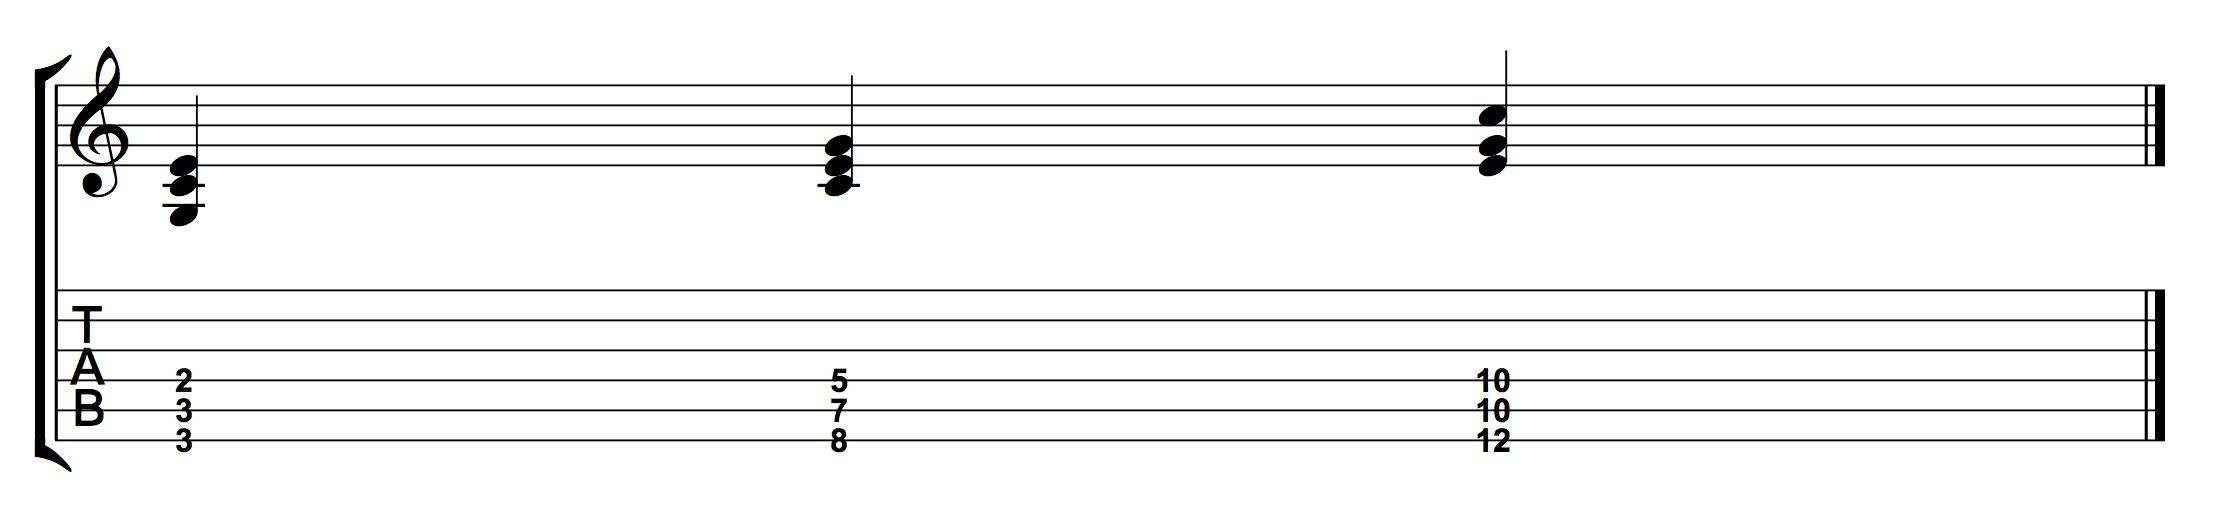 C Major Triad 3 Shapes 456